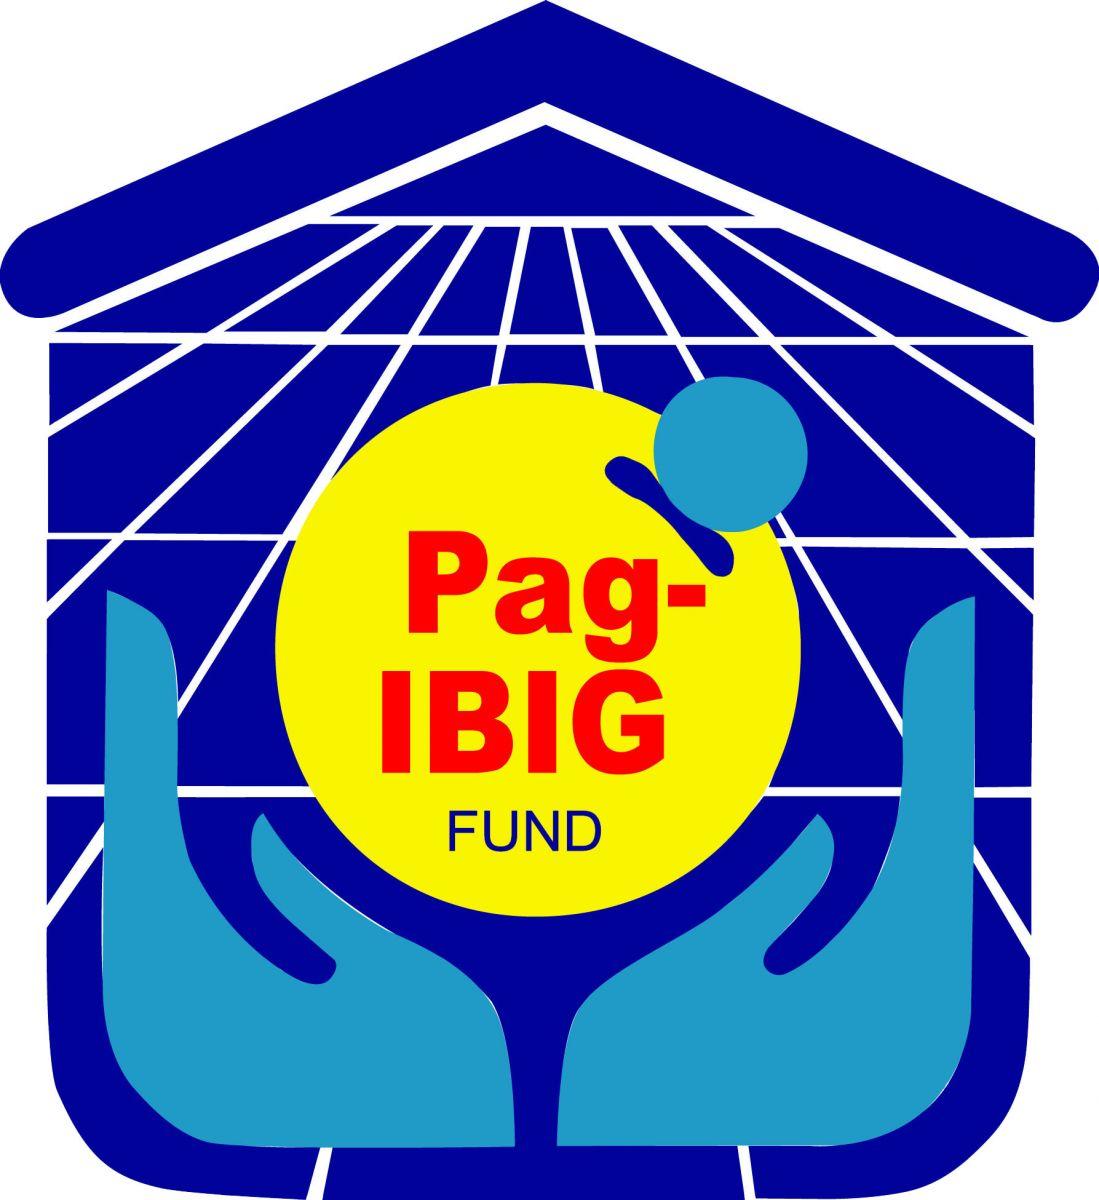 Pag ibig logo 1 Our Clientele